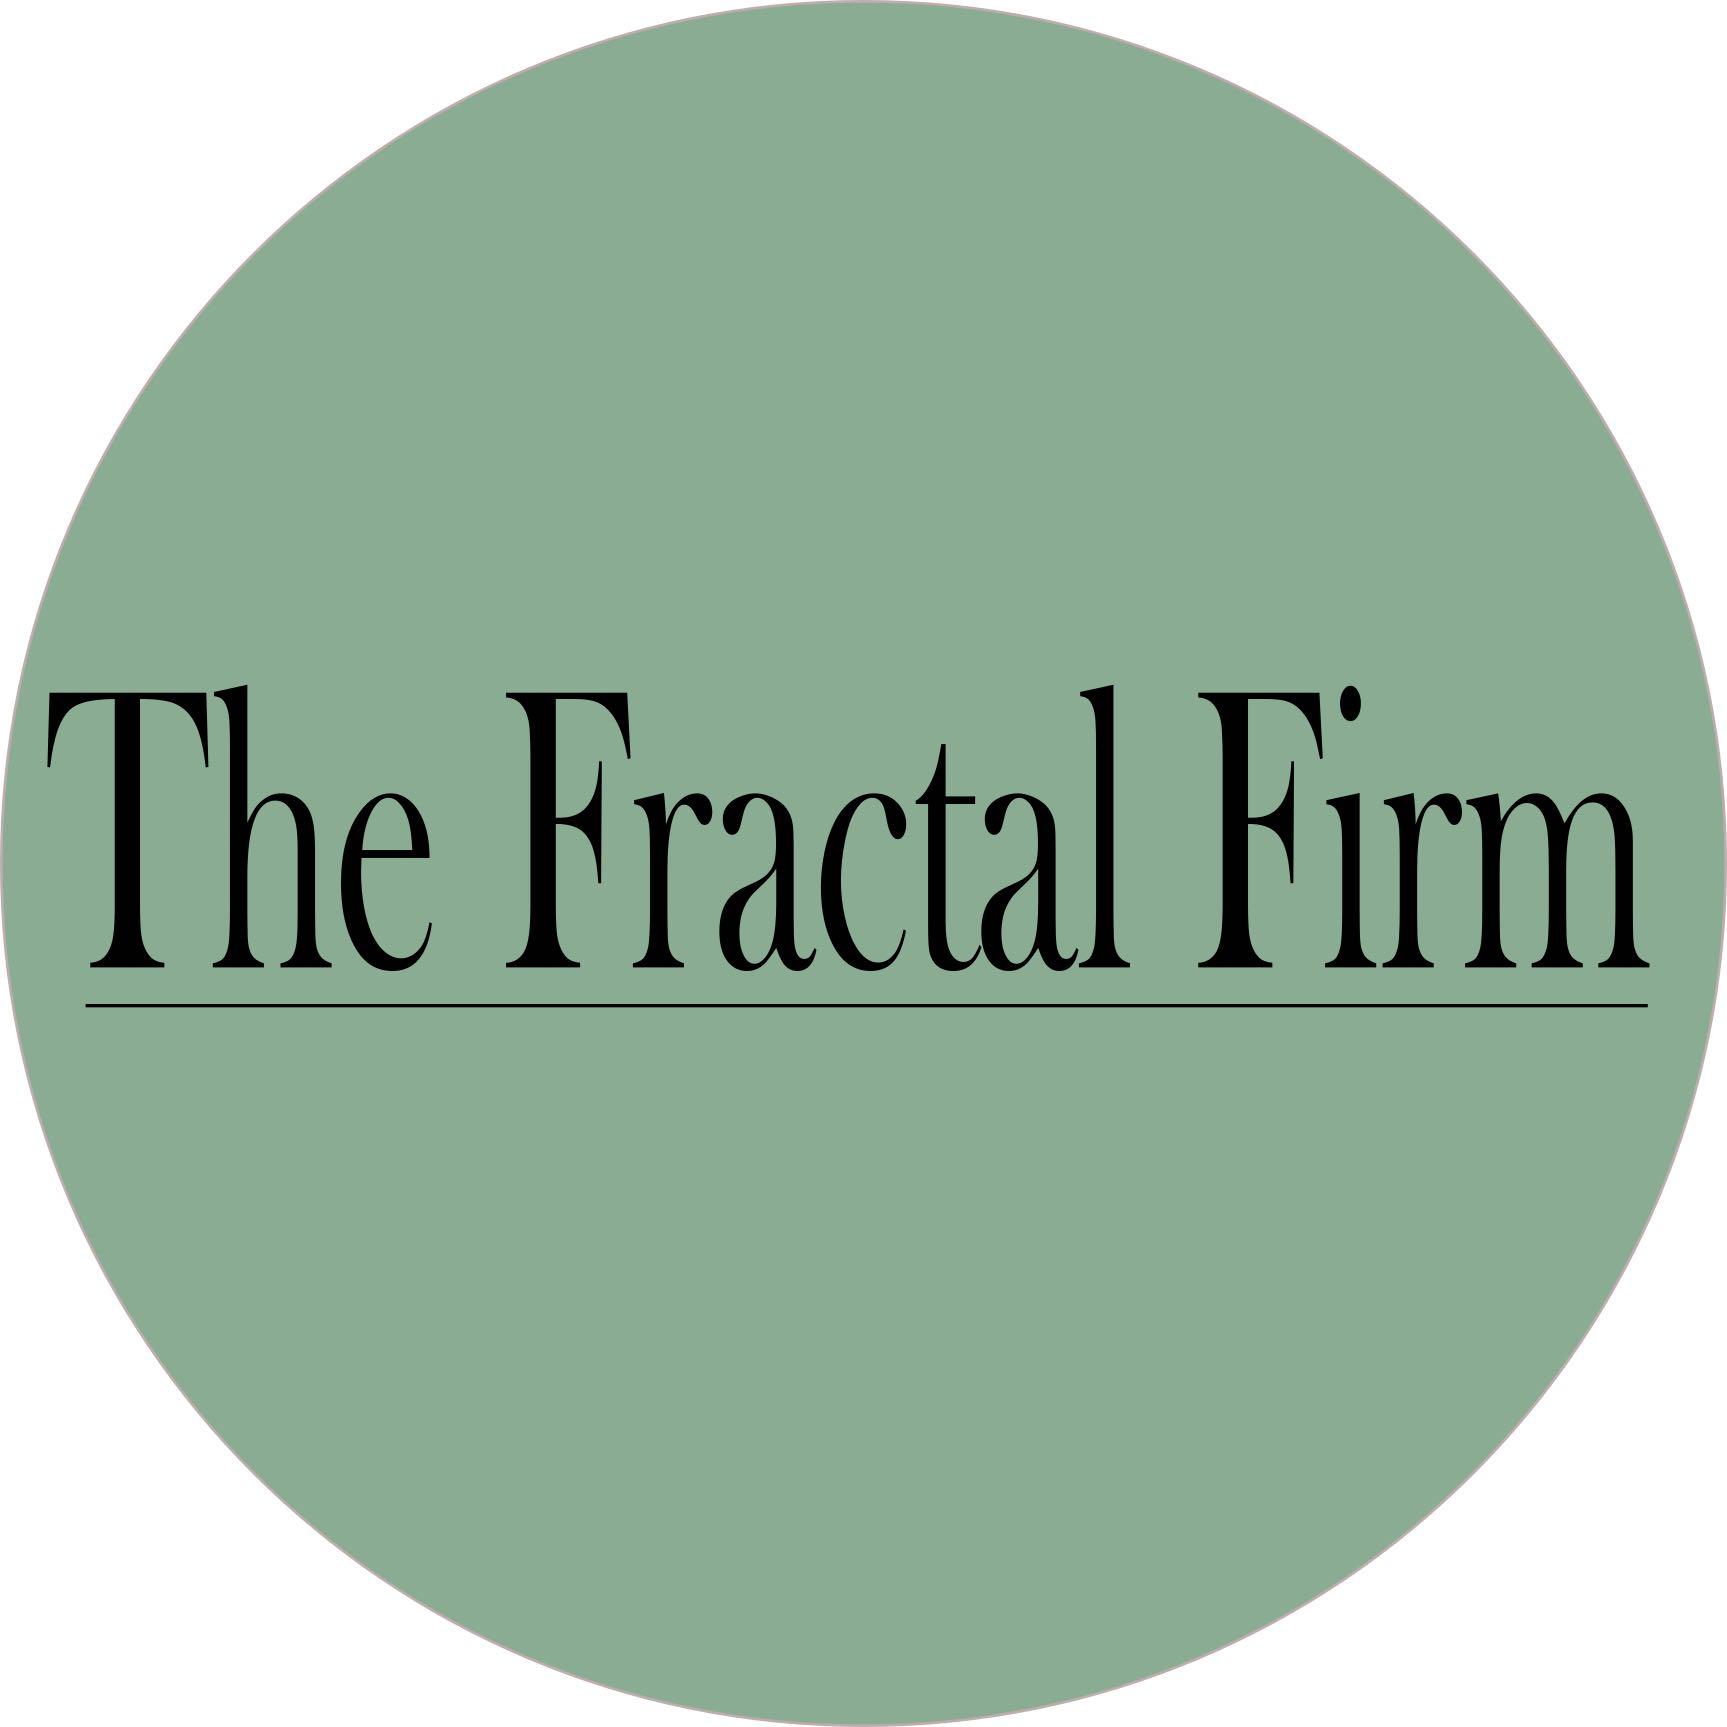 thefractalfirm